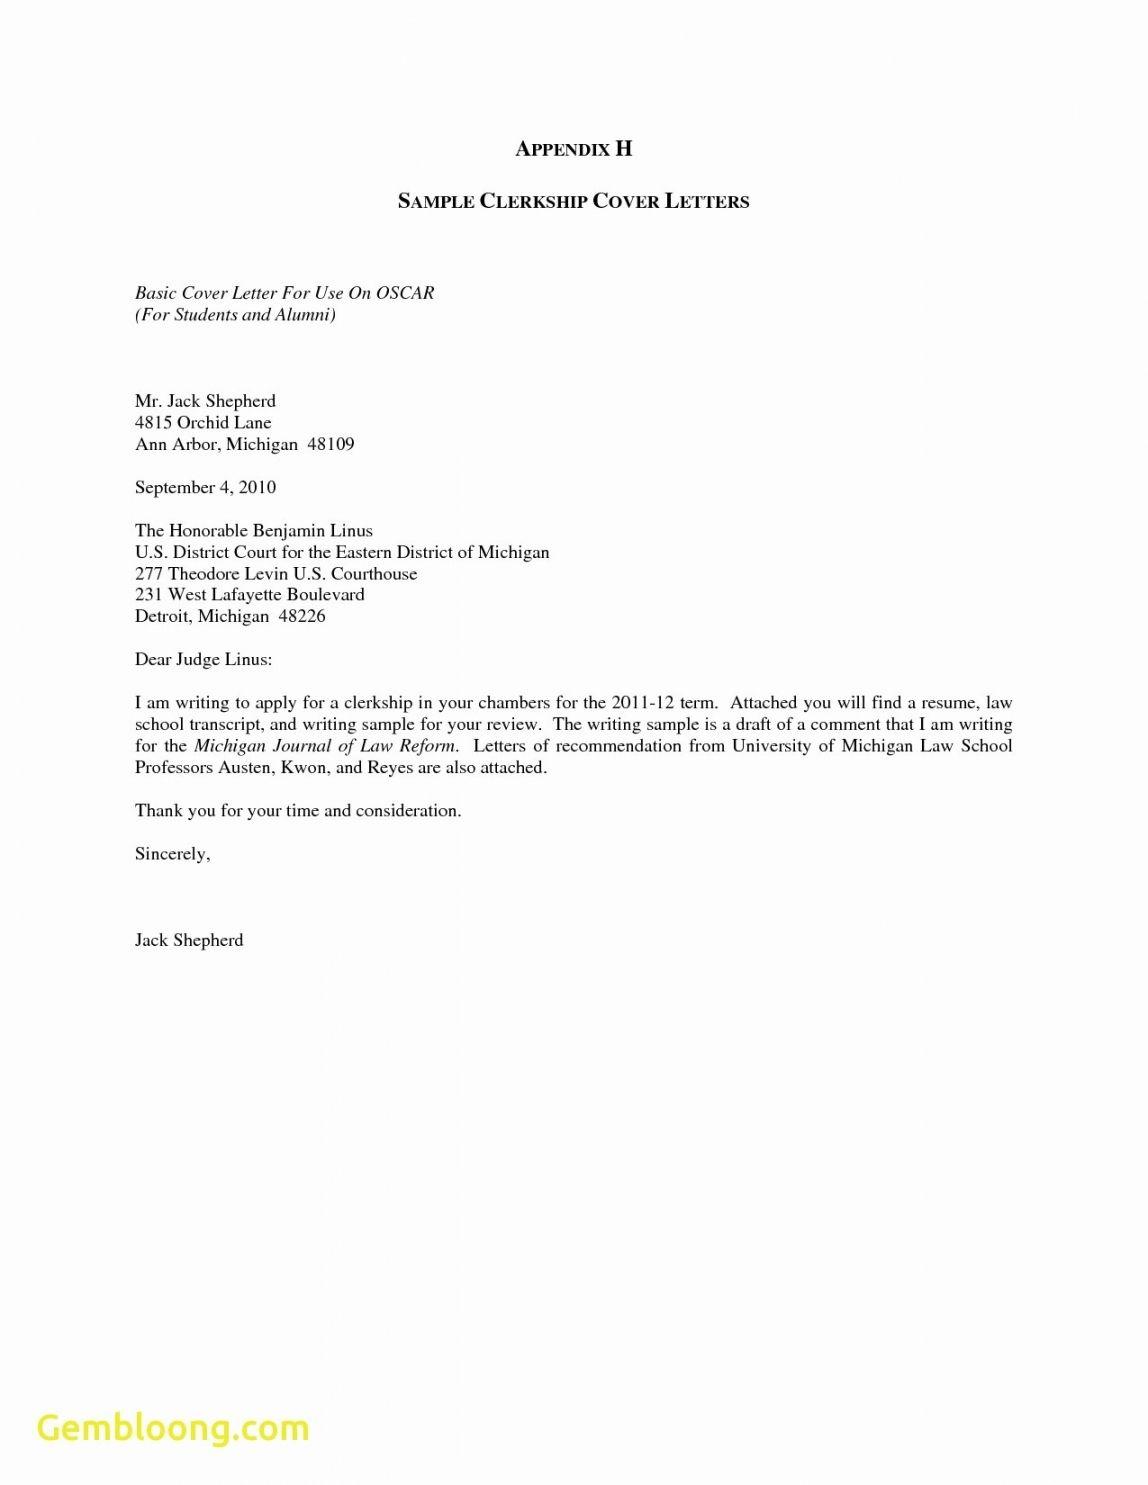 30 Generic Cover Letter Cover Letter For Resume Basic Cover